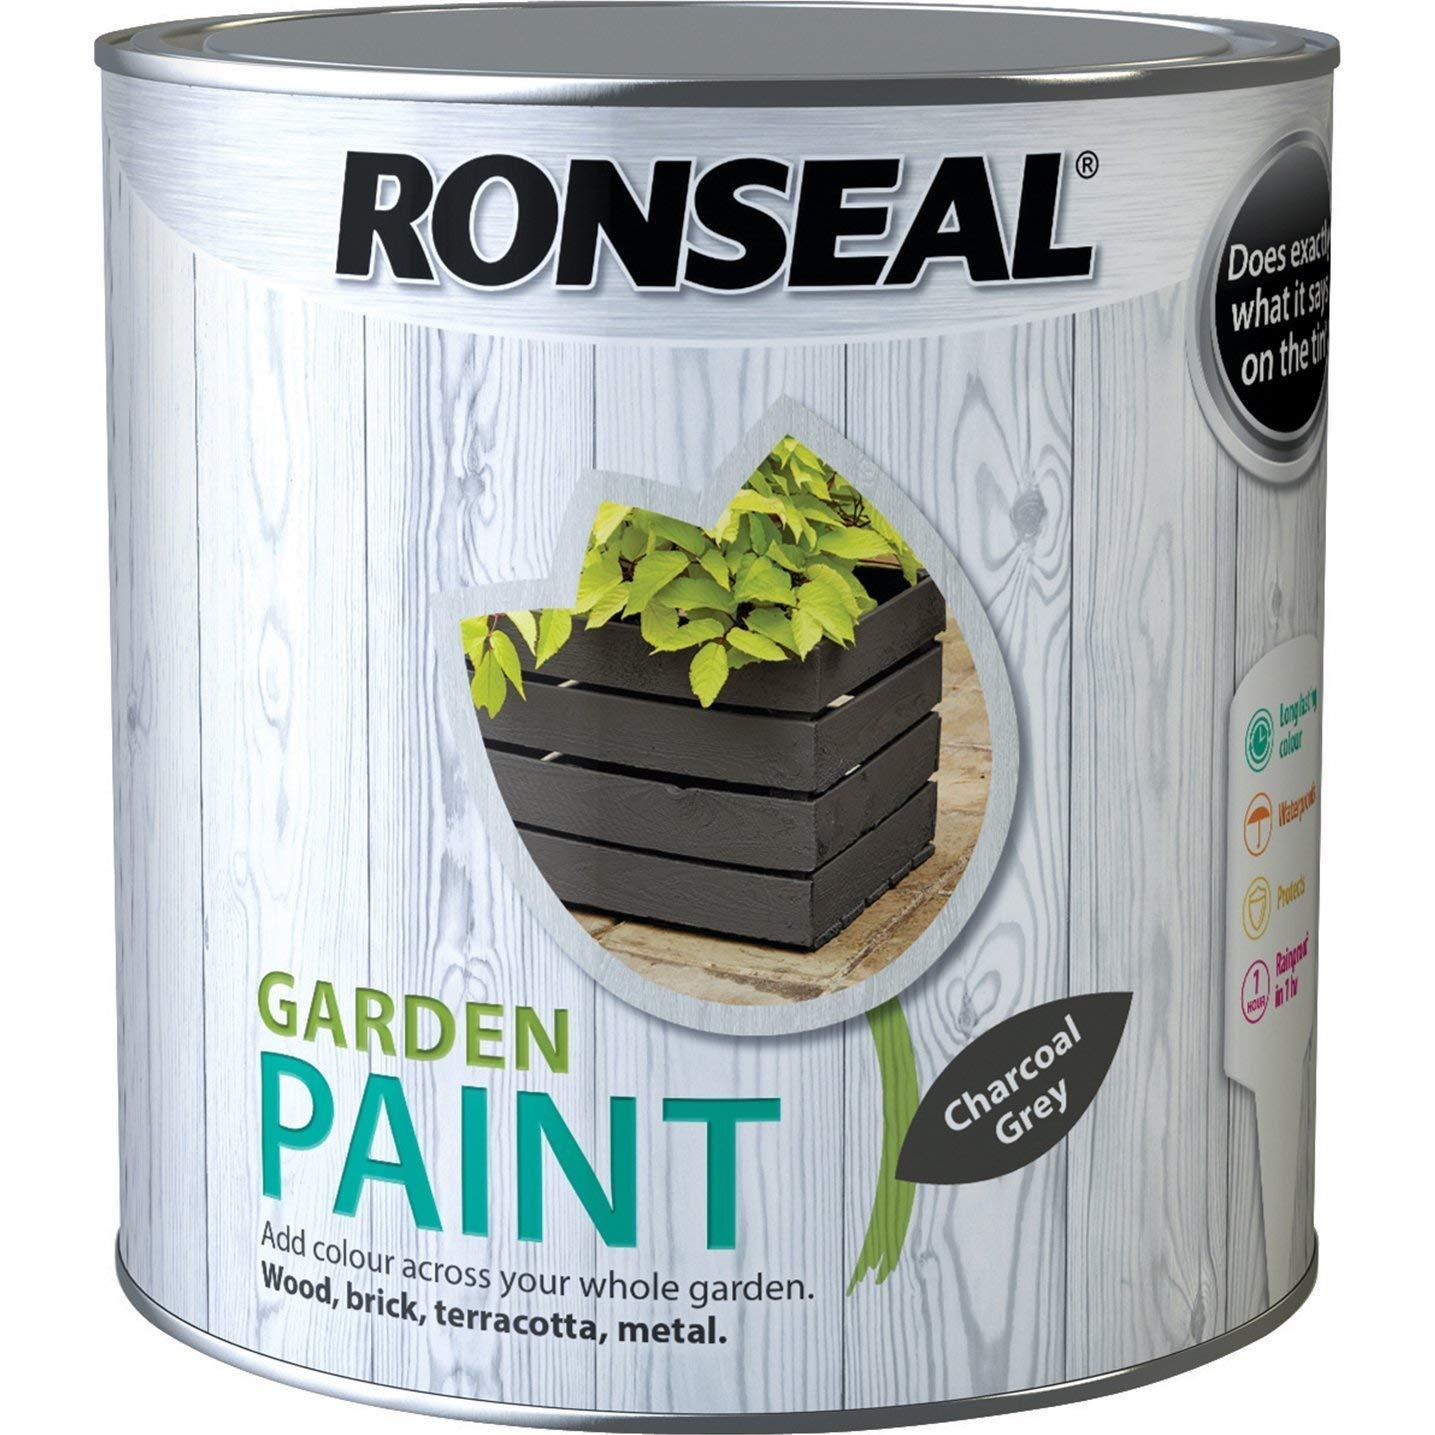 Ronseal Garden Paint 2.5l, Charcoal Grey